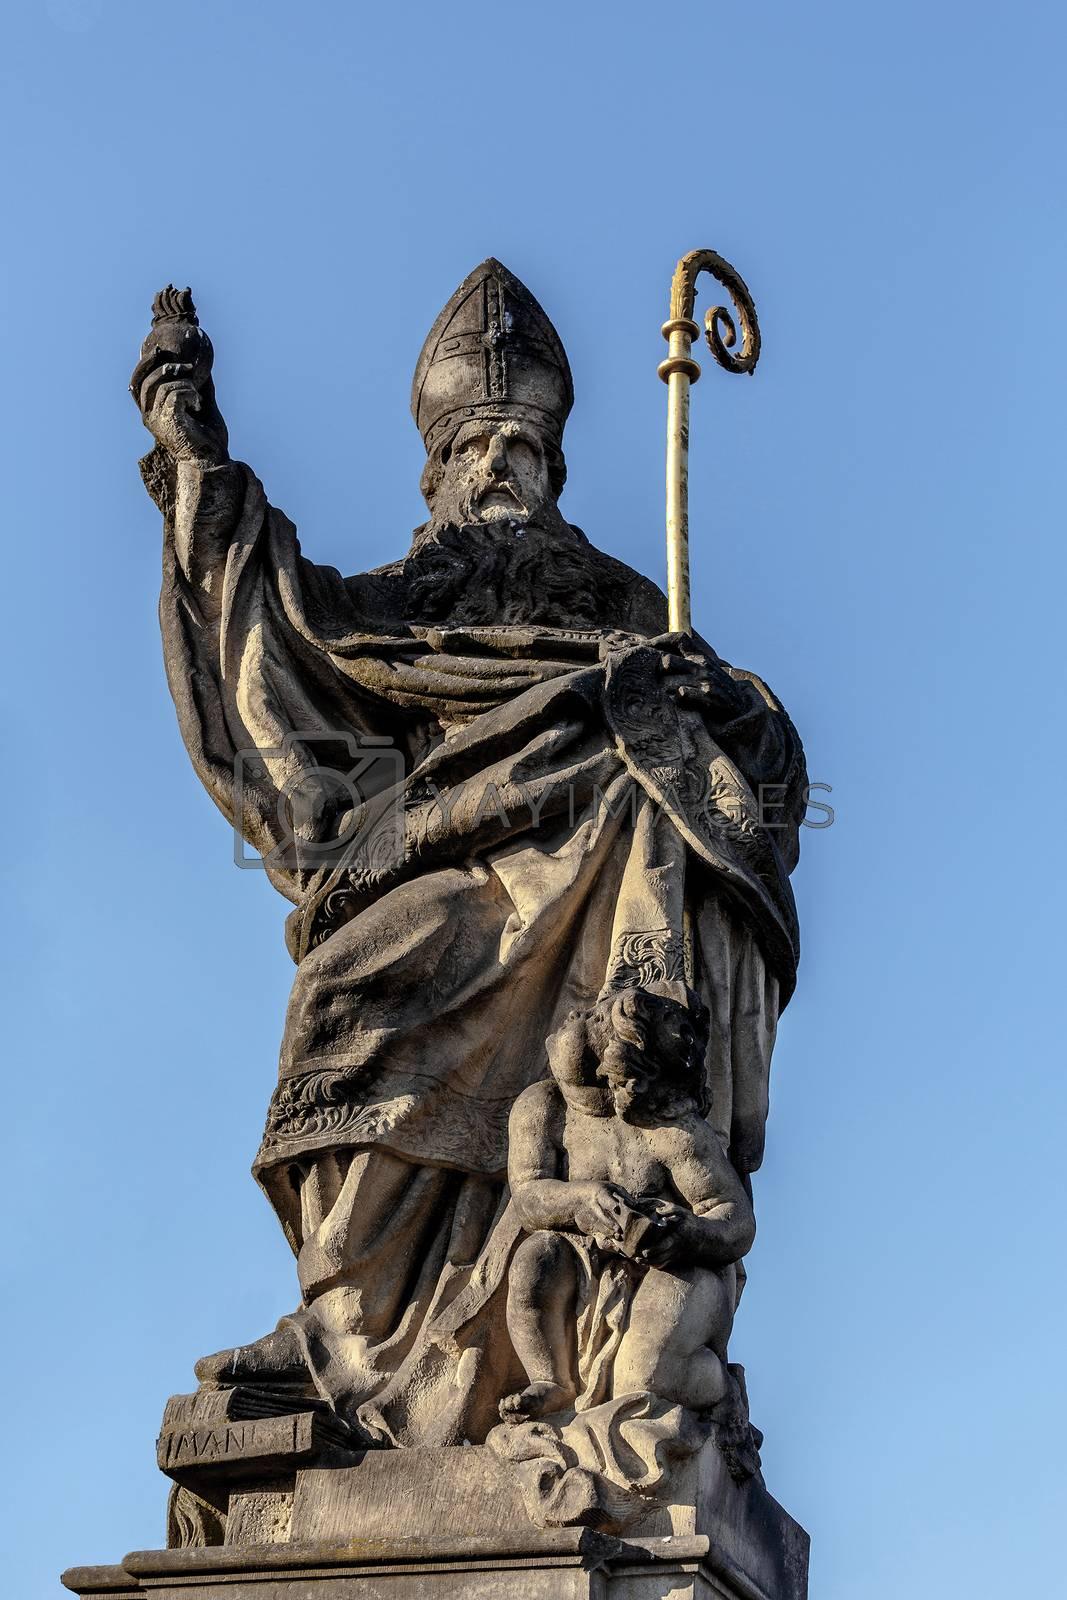 Royalty free image of Staue on the Charles Bridge in Prague, Czech Republic. by artush